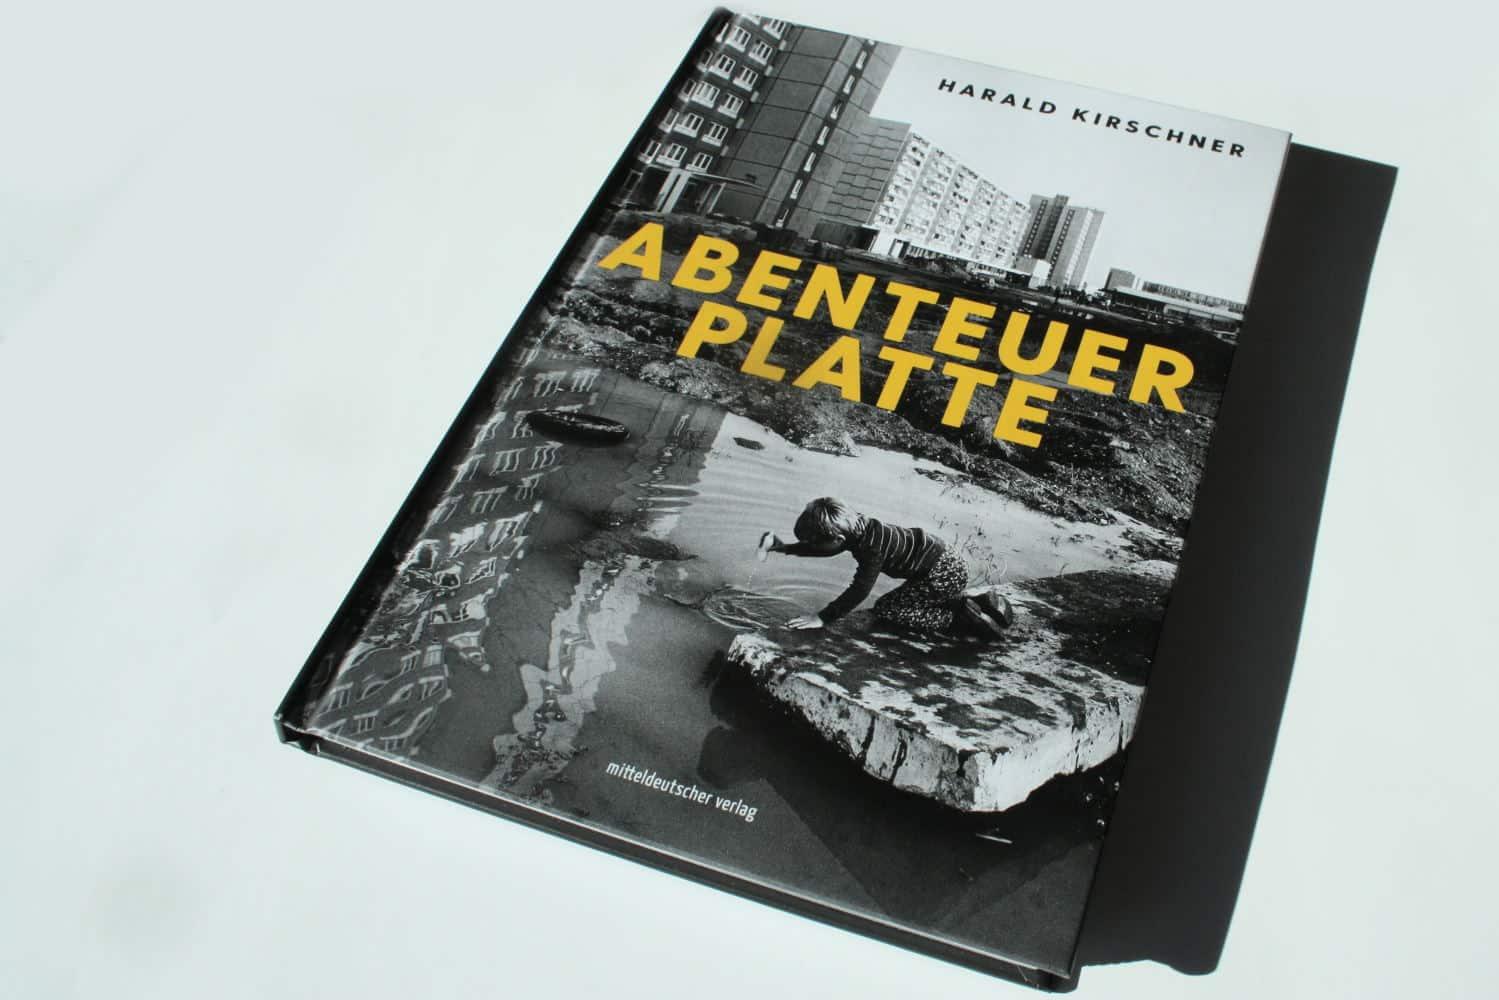 Harald Kirschner: Abenteuer Platte. Foto: Ralf Julke